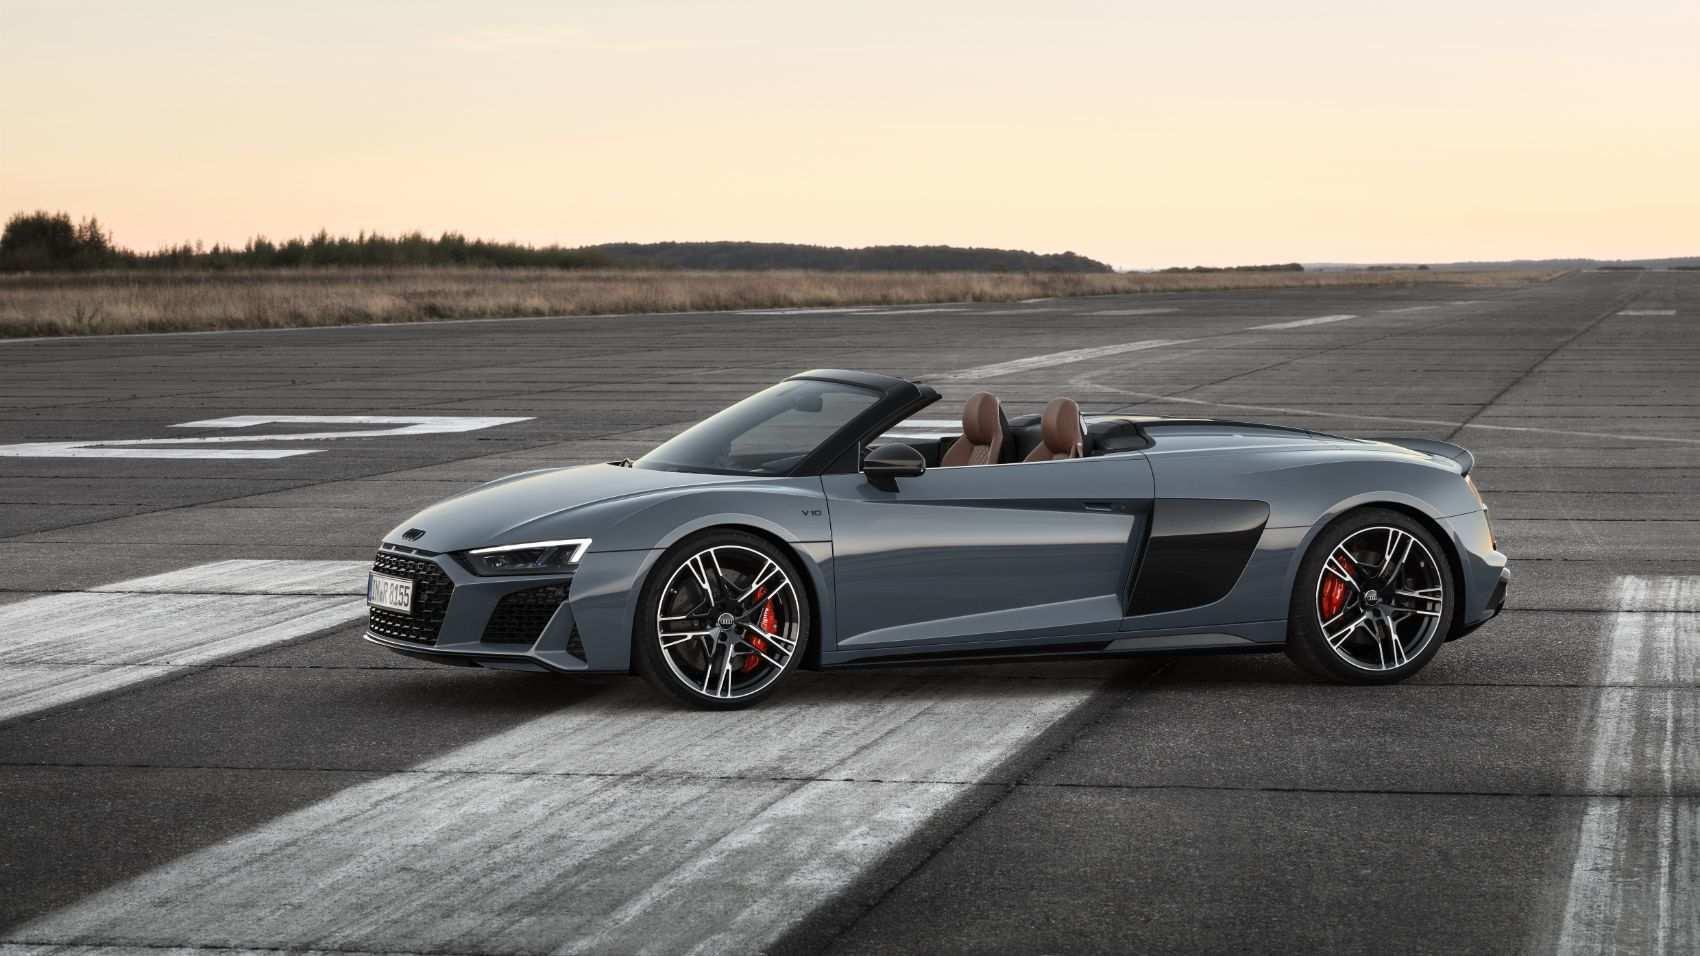 29 Best Review Audi Supercar 2020 Performance for Audi Supercar 2020